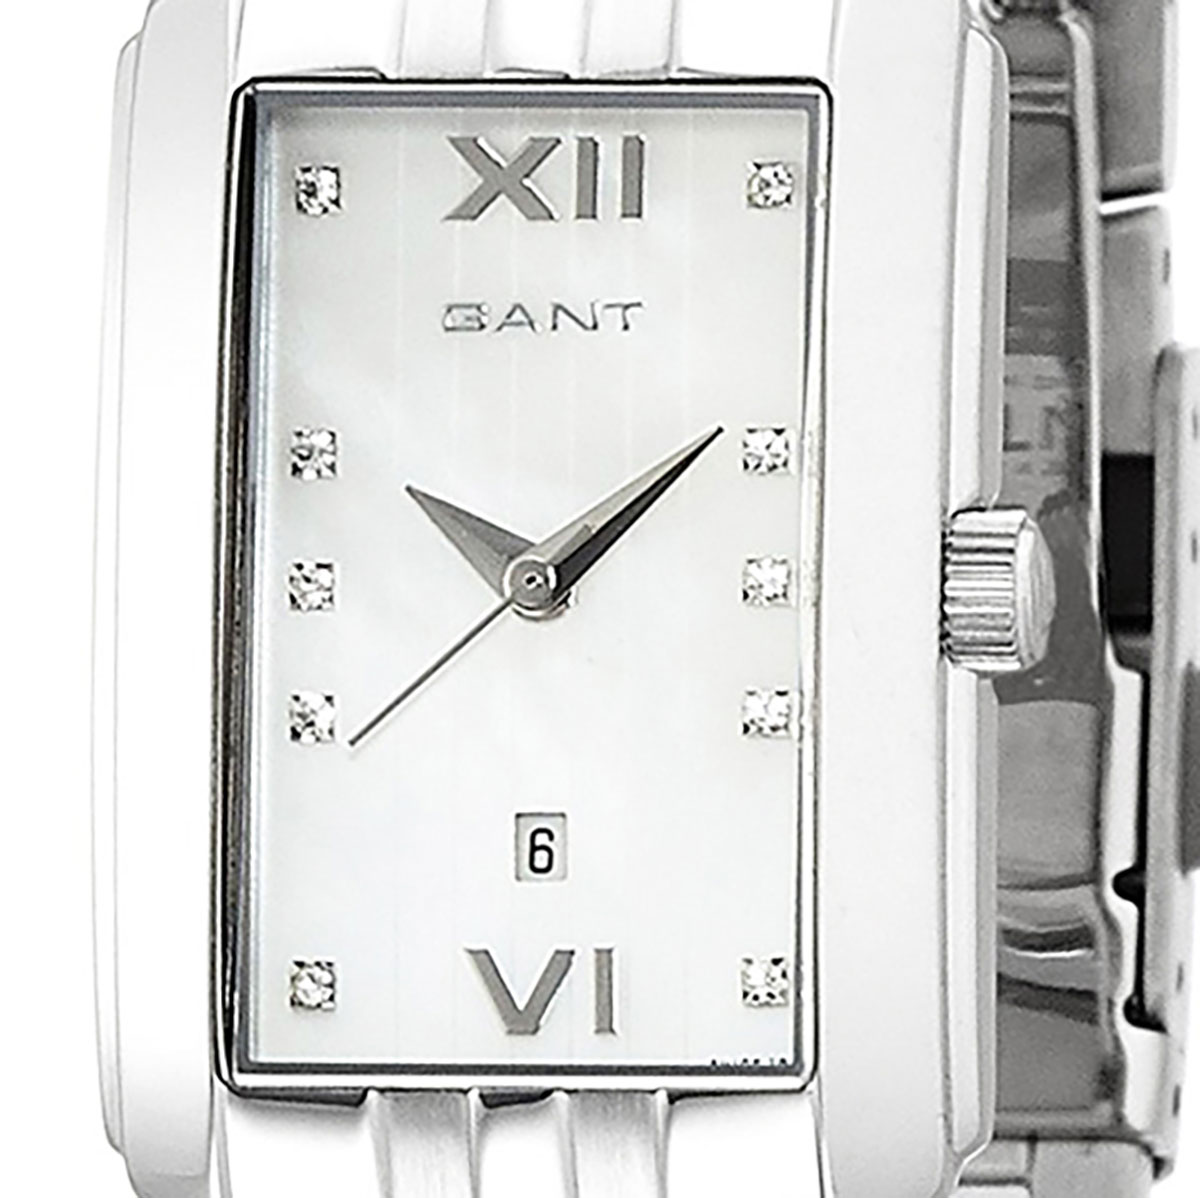 GANT ガント 電池式クォーツ 腕時計 [W10622] 並行輸入品 ホワイト(白)